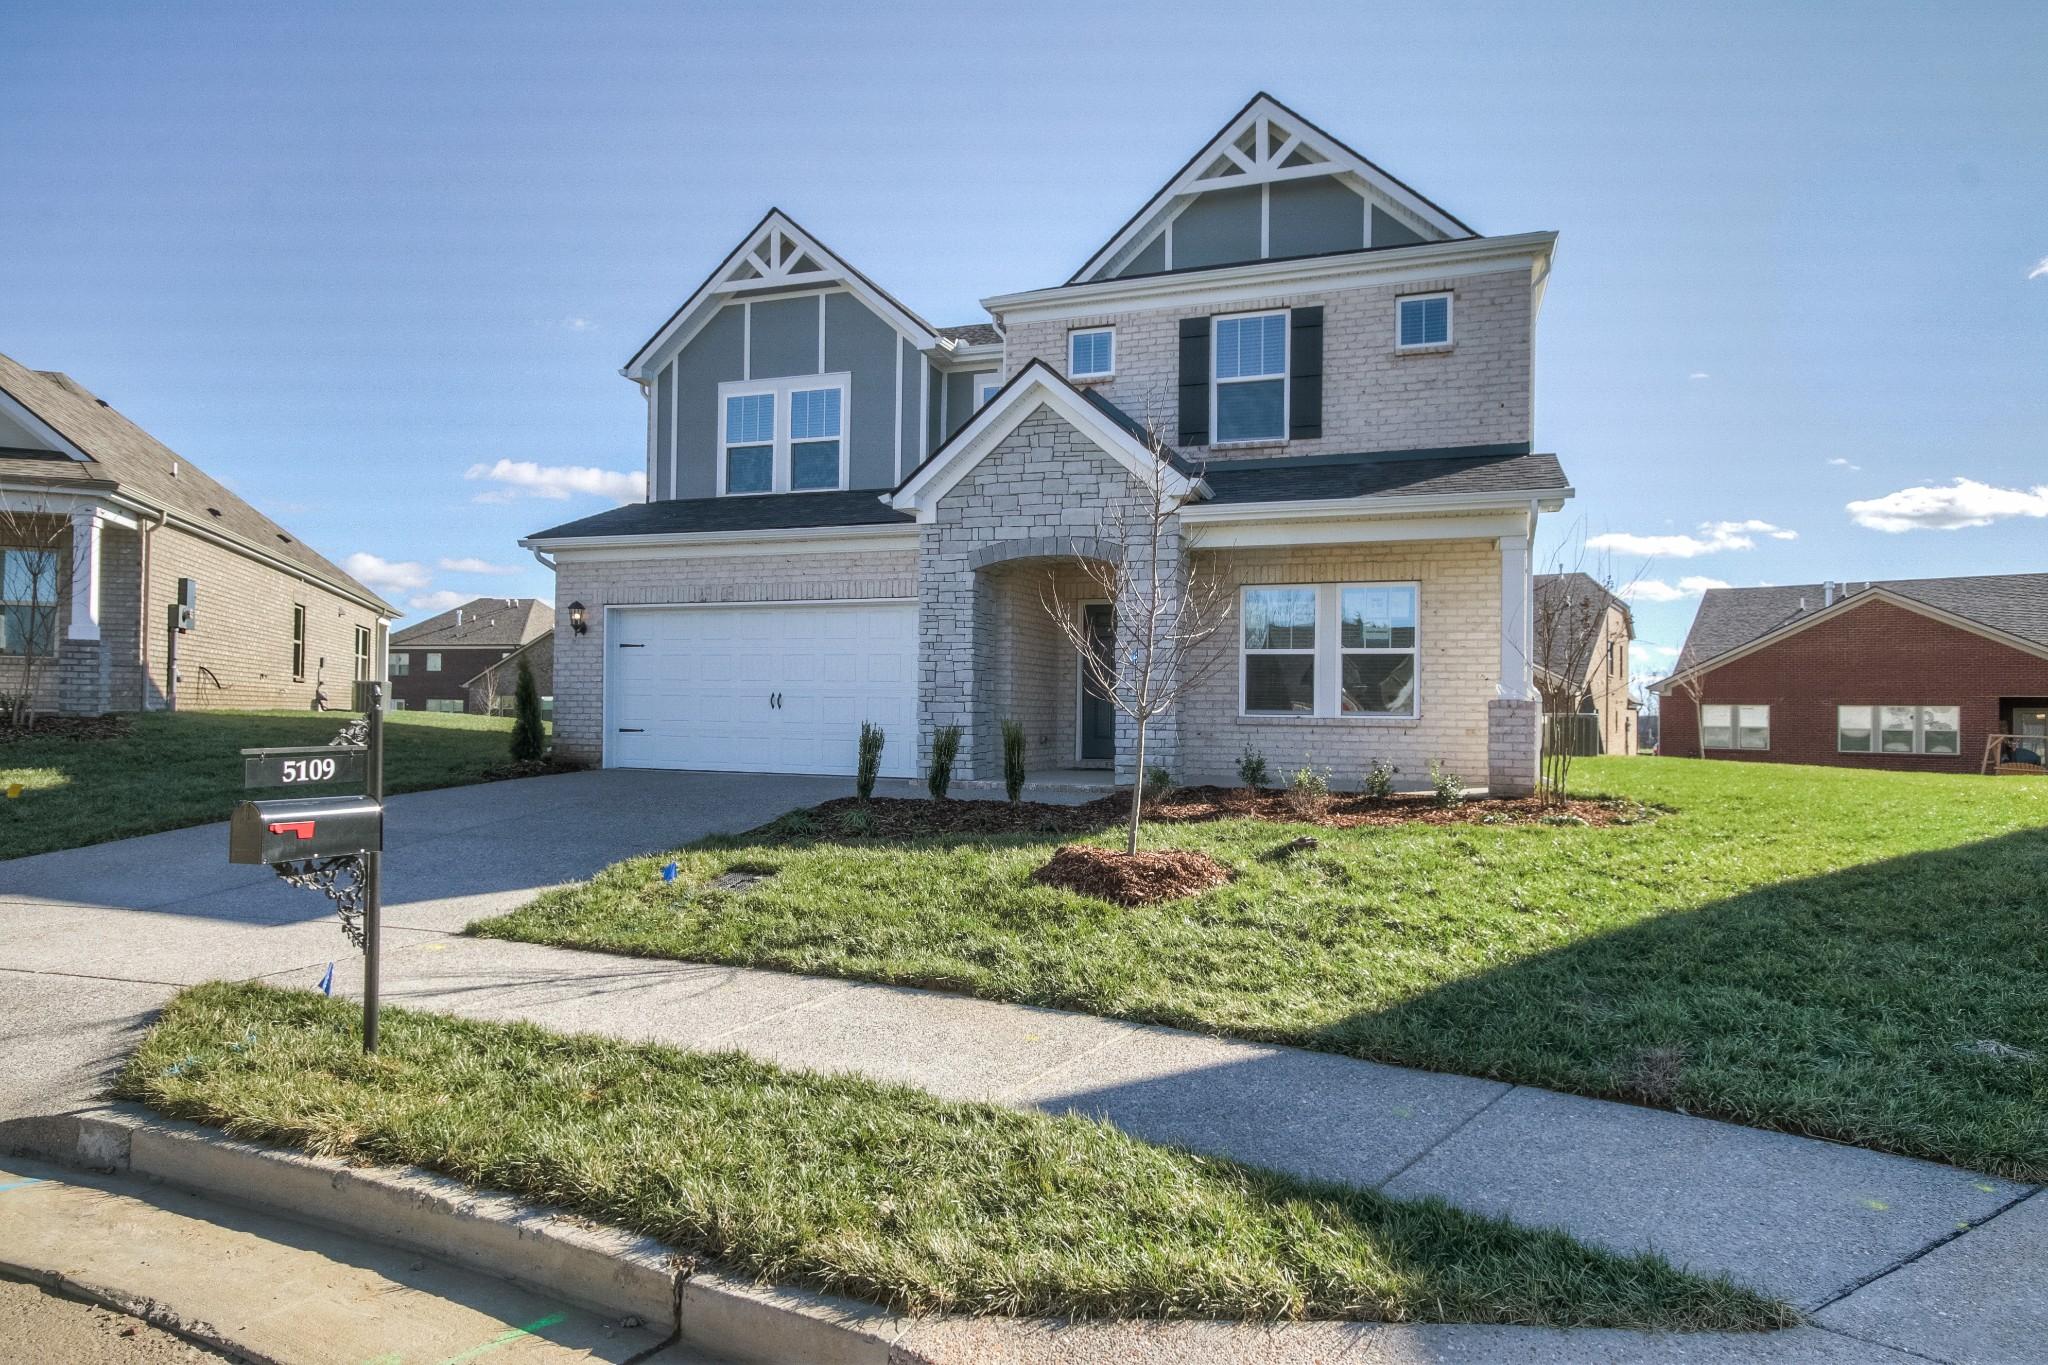 5109 Helmsdale Crt, Hermitage, TN 37076 - Hermitage, TN real estate listing